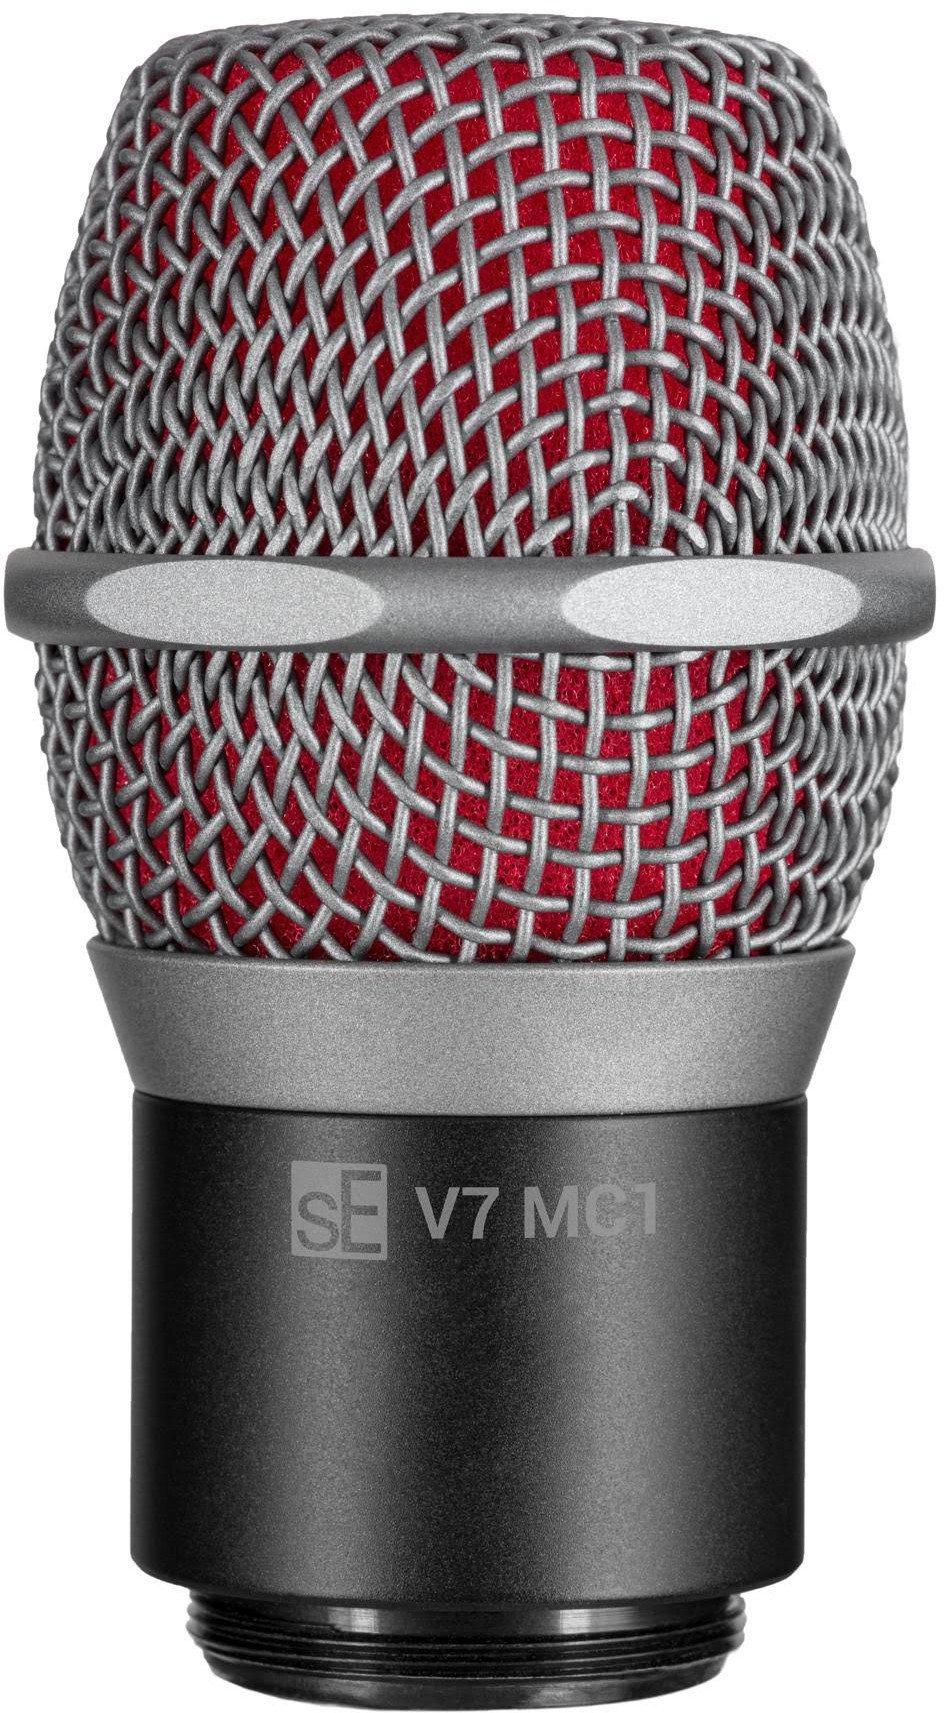 sE Electronics V7 MC1 Capsule for Wireless by SE Electronics